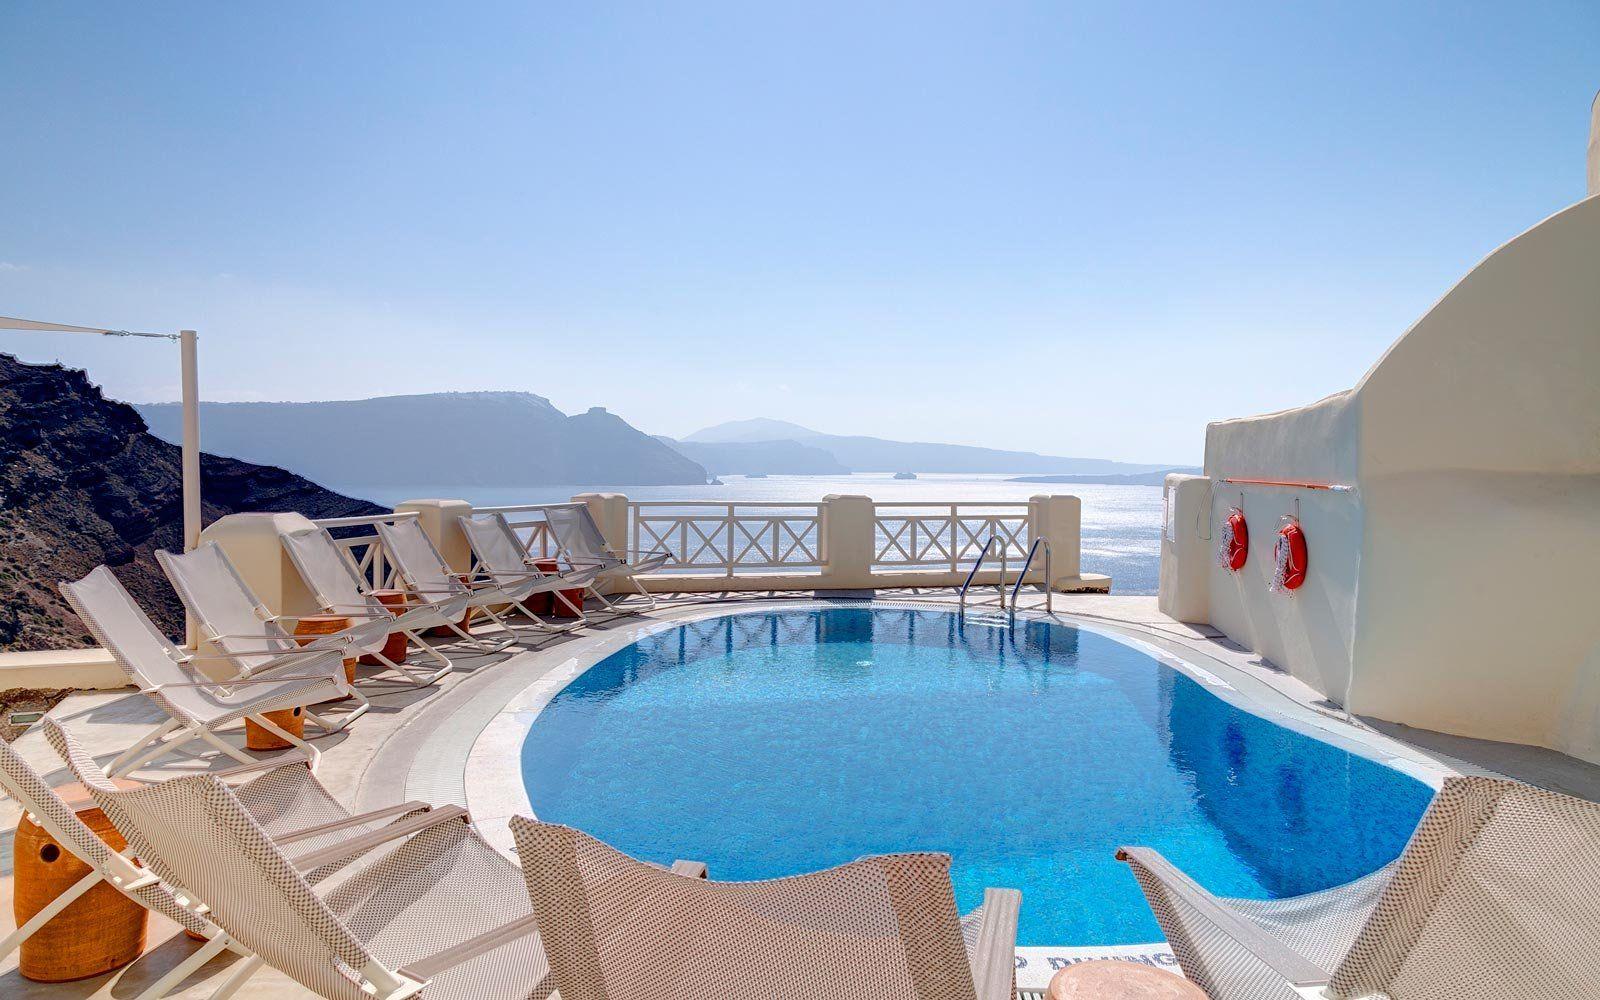 Top 10 Greece Resort Hotels   Greece resorts, Best resorts, Hotels ...